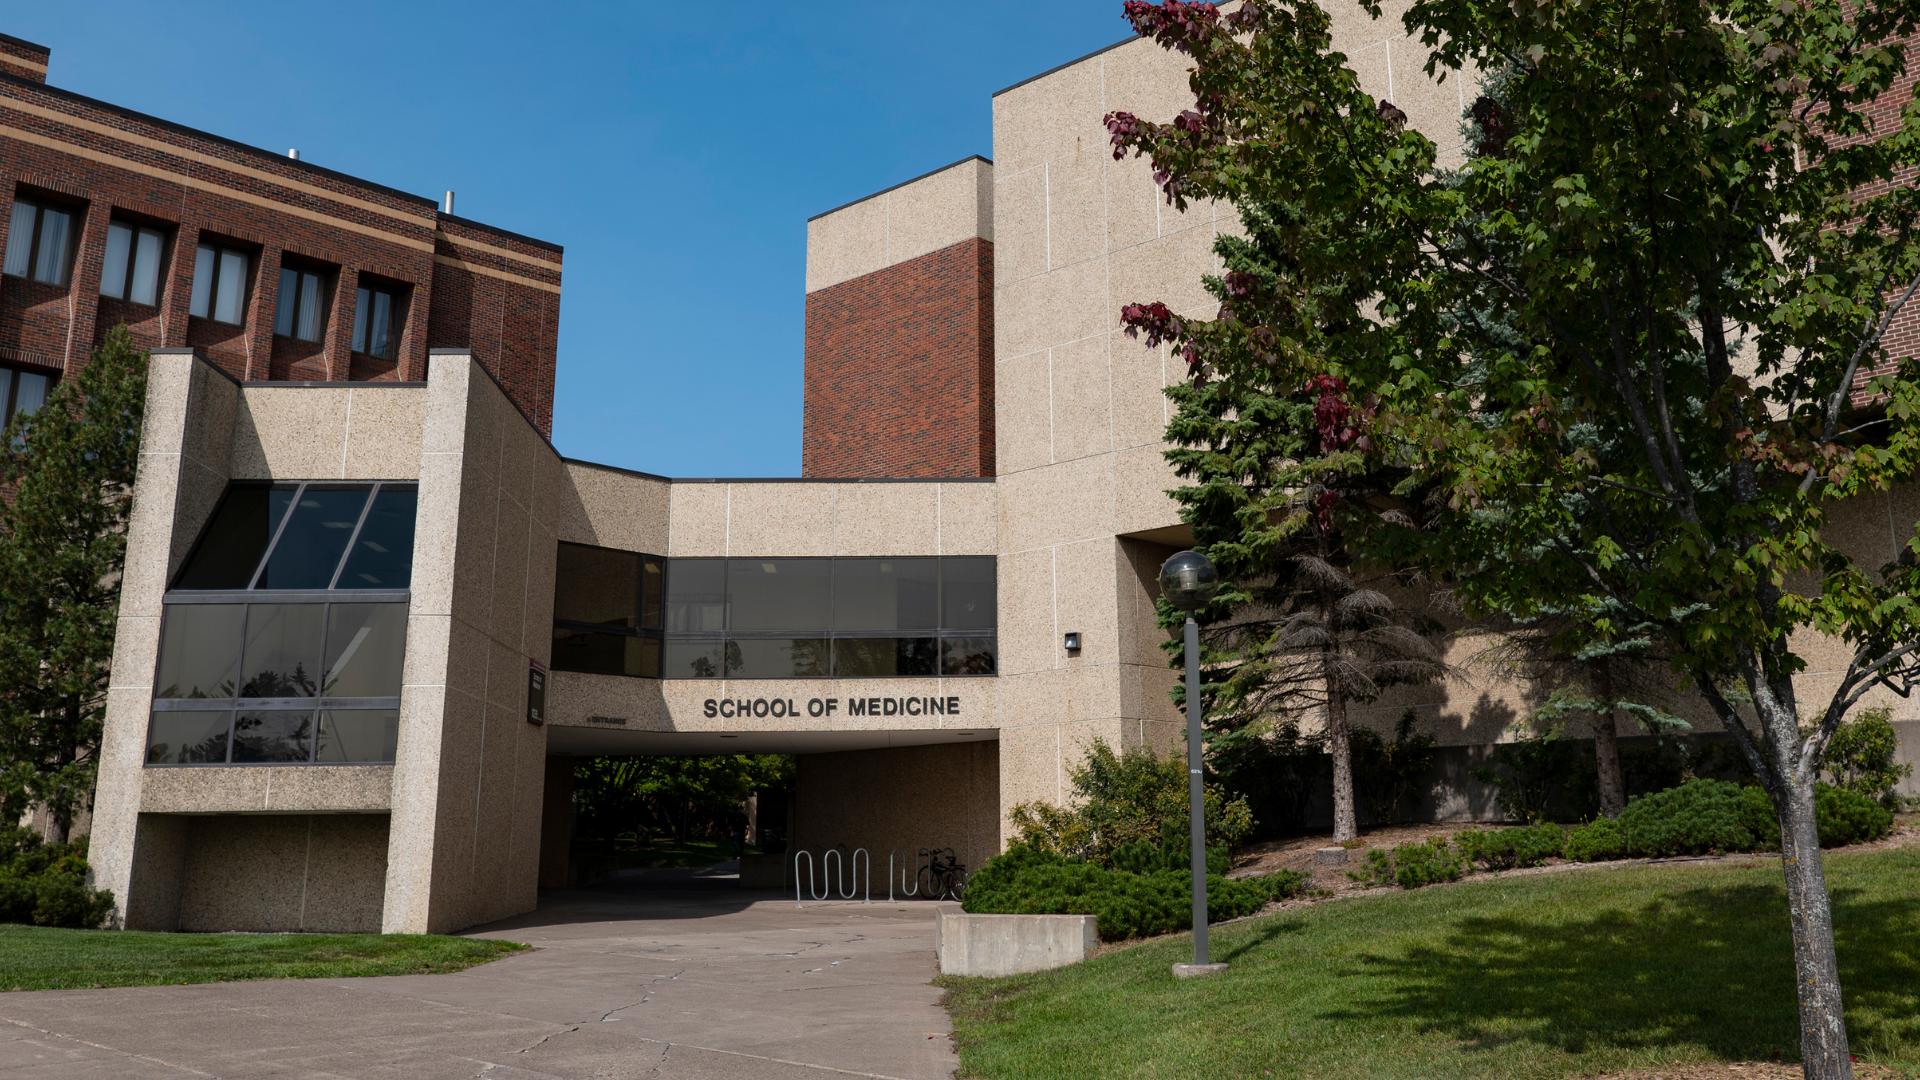 U of M Medical School Seeks Applicants for Regional Dean to Lead the Duluth Campus